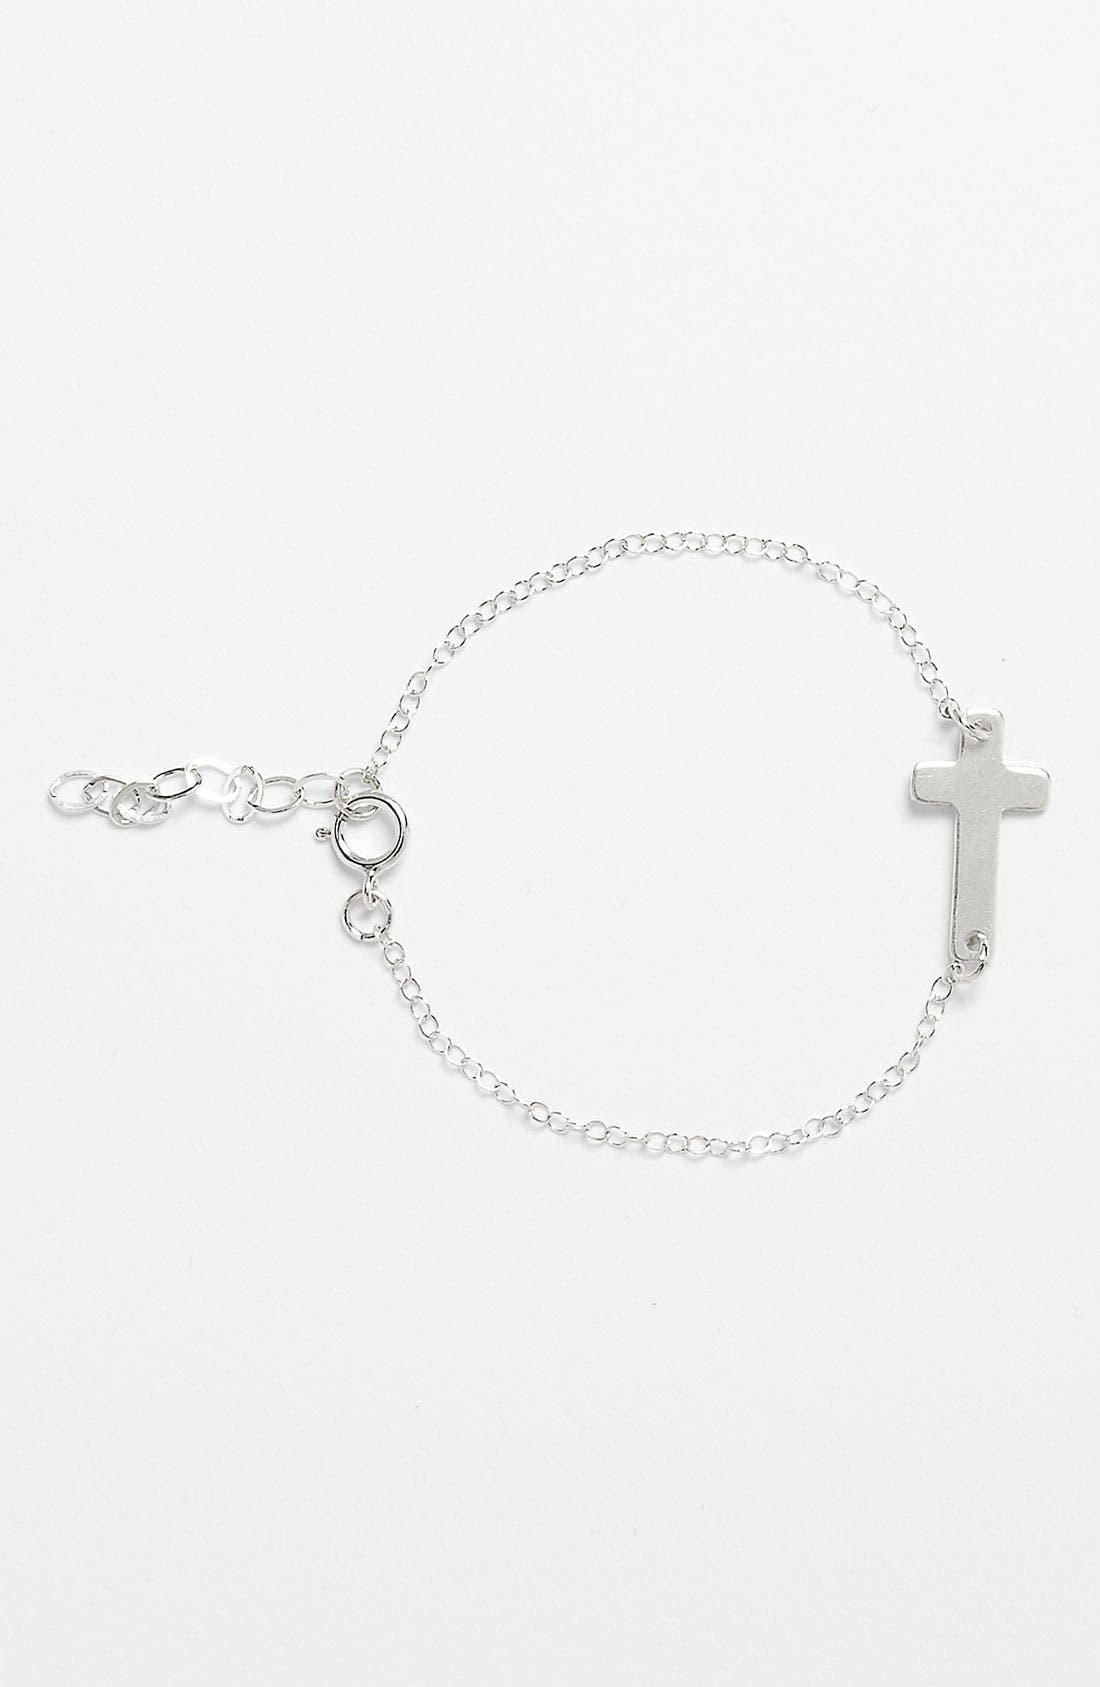 Alternate Image 1 Selected - Abela Designs Sideways Cross Bracelet (Girls)